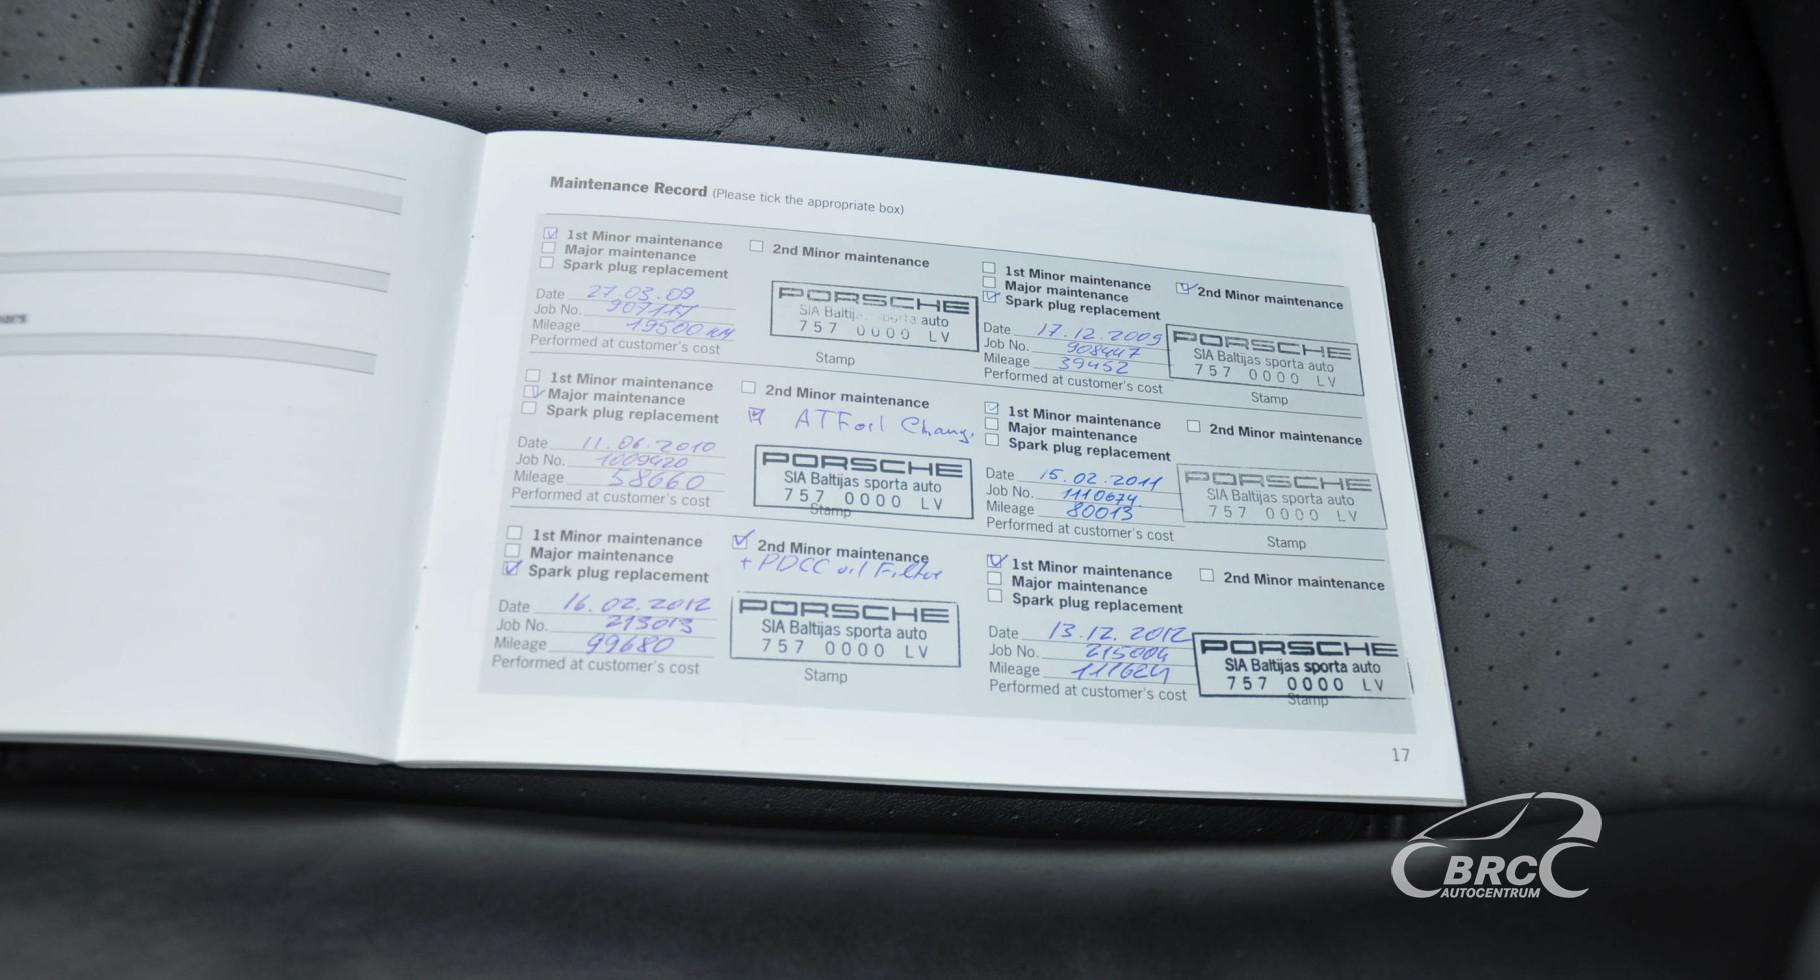 Porsche Cayenne Turbo 4 8 Automatas (ID: 805546) | BRC Autocentrum